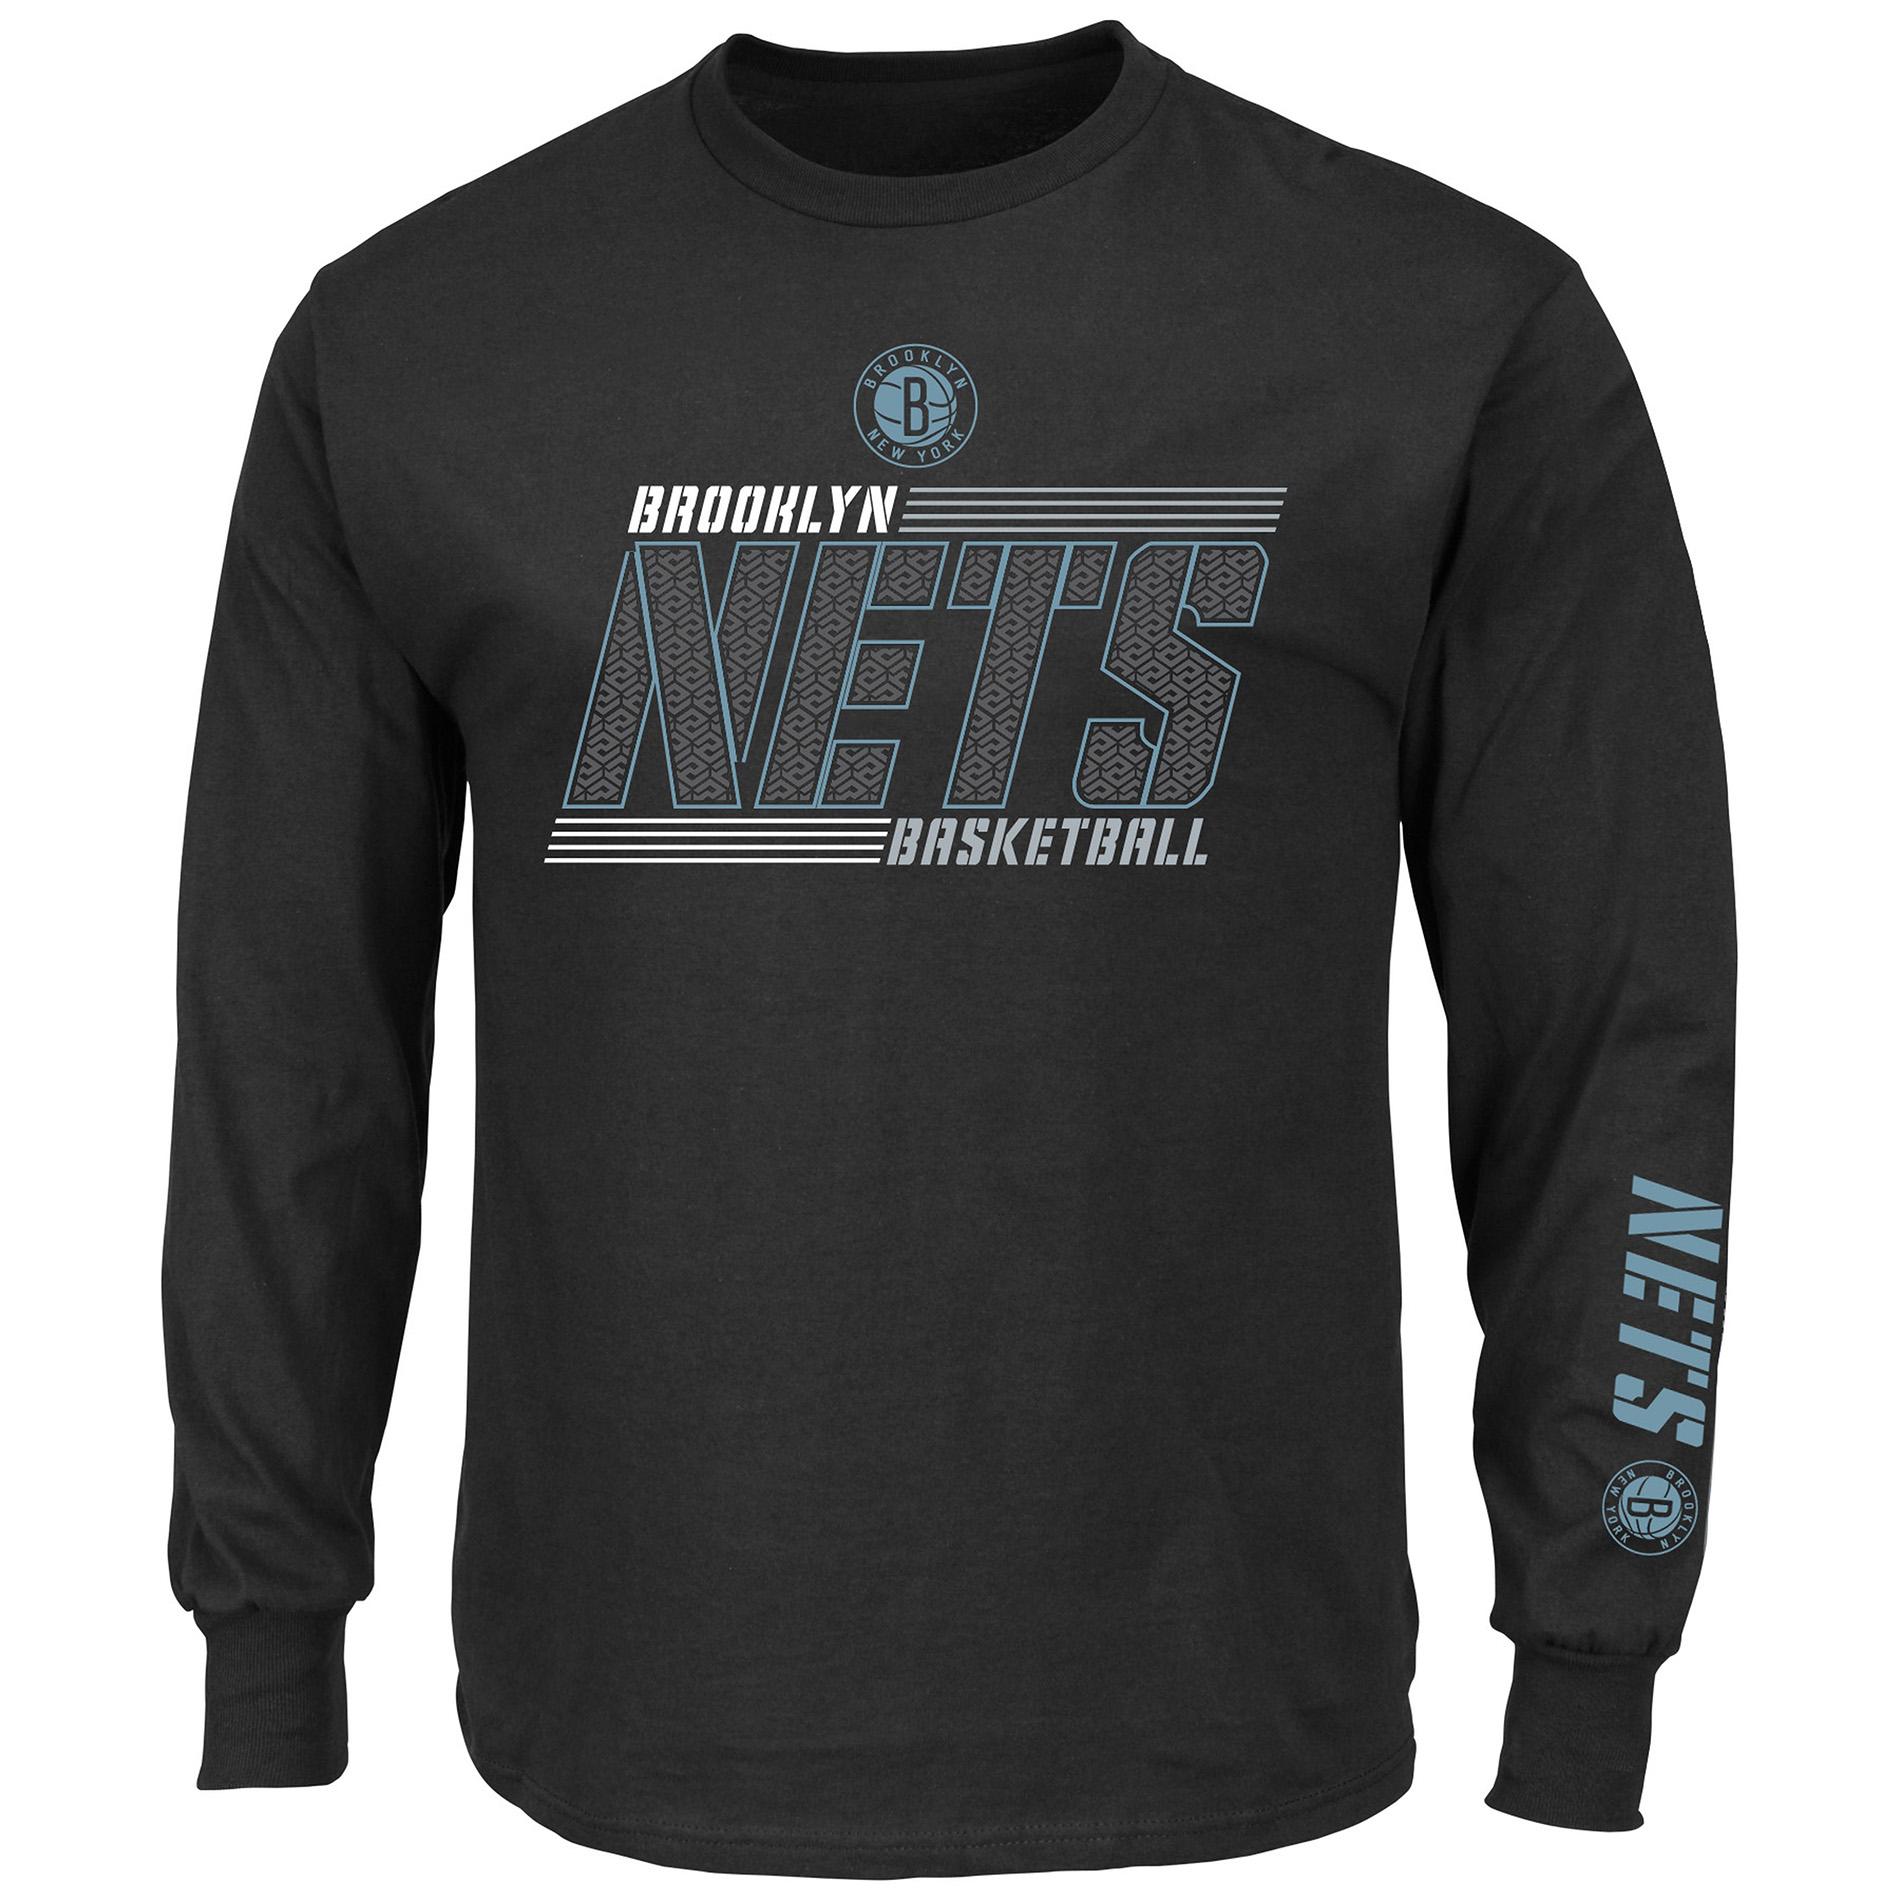 NBA Men's Long-Sleeve Pullover - Brooklyn Nets, Size: Large